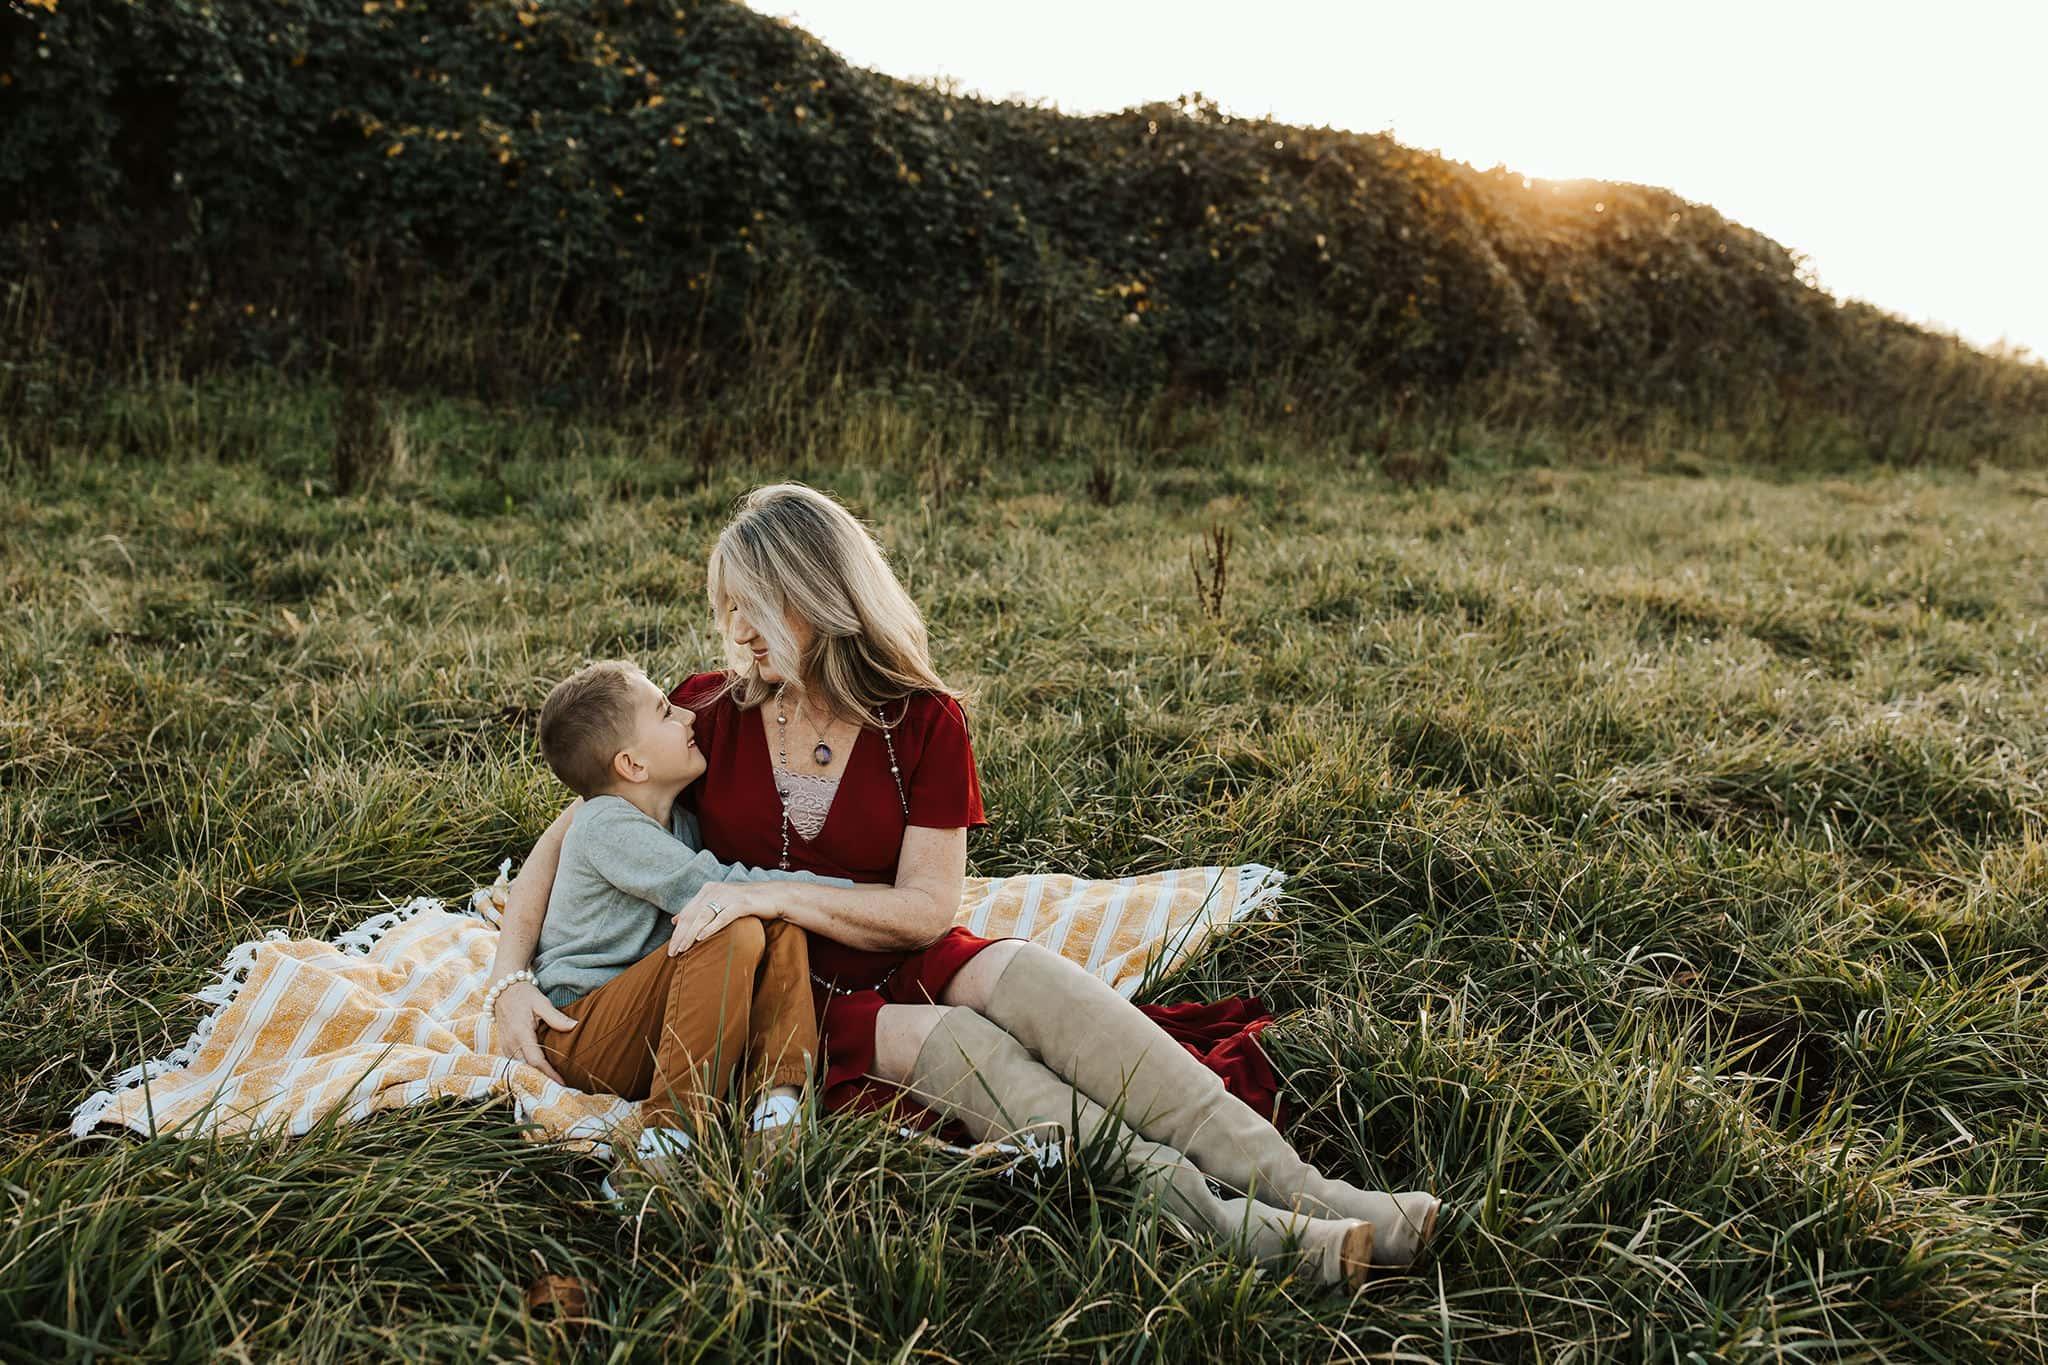 Mom cuddling son on blanket - candid family